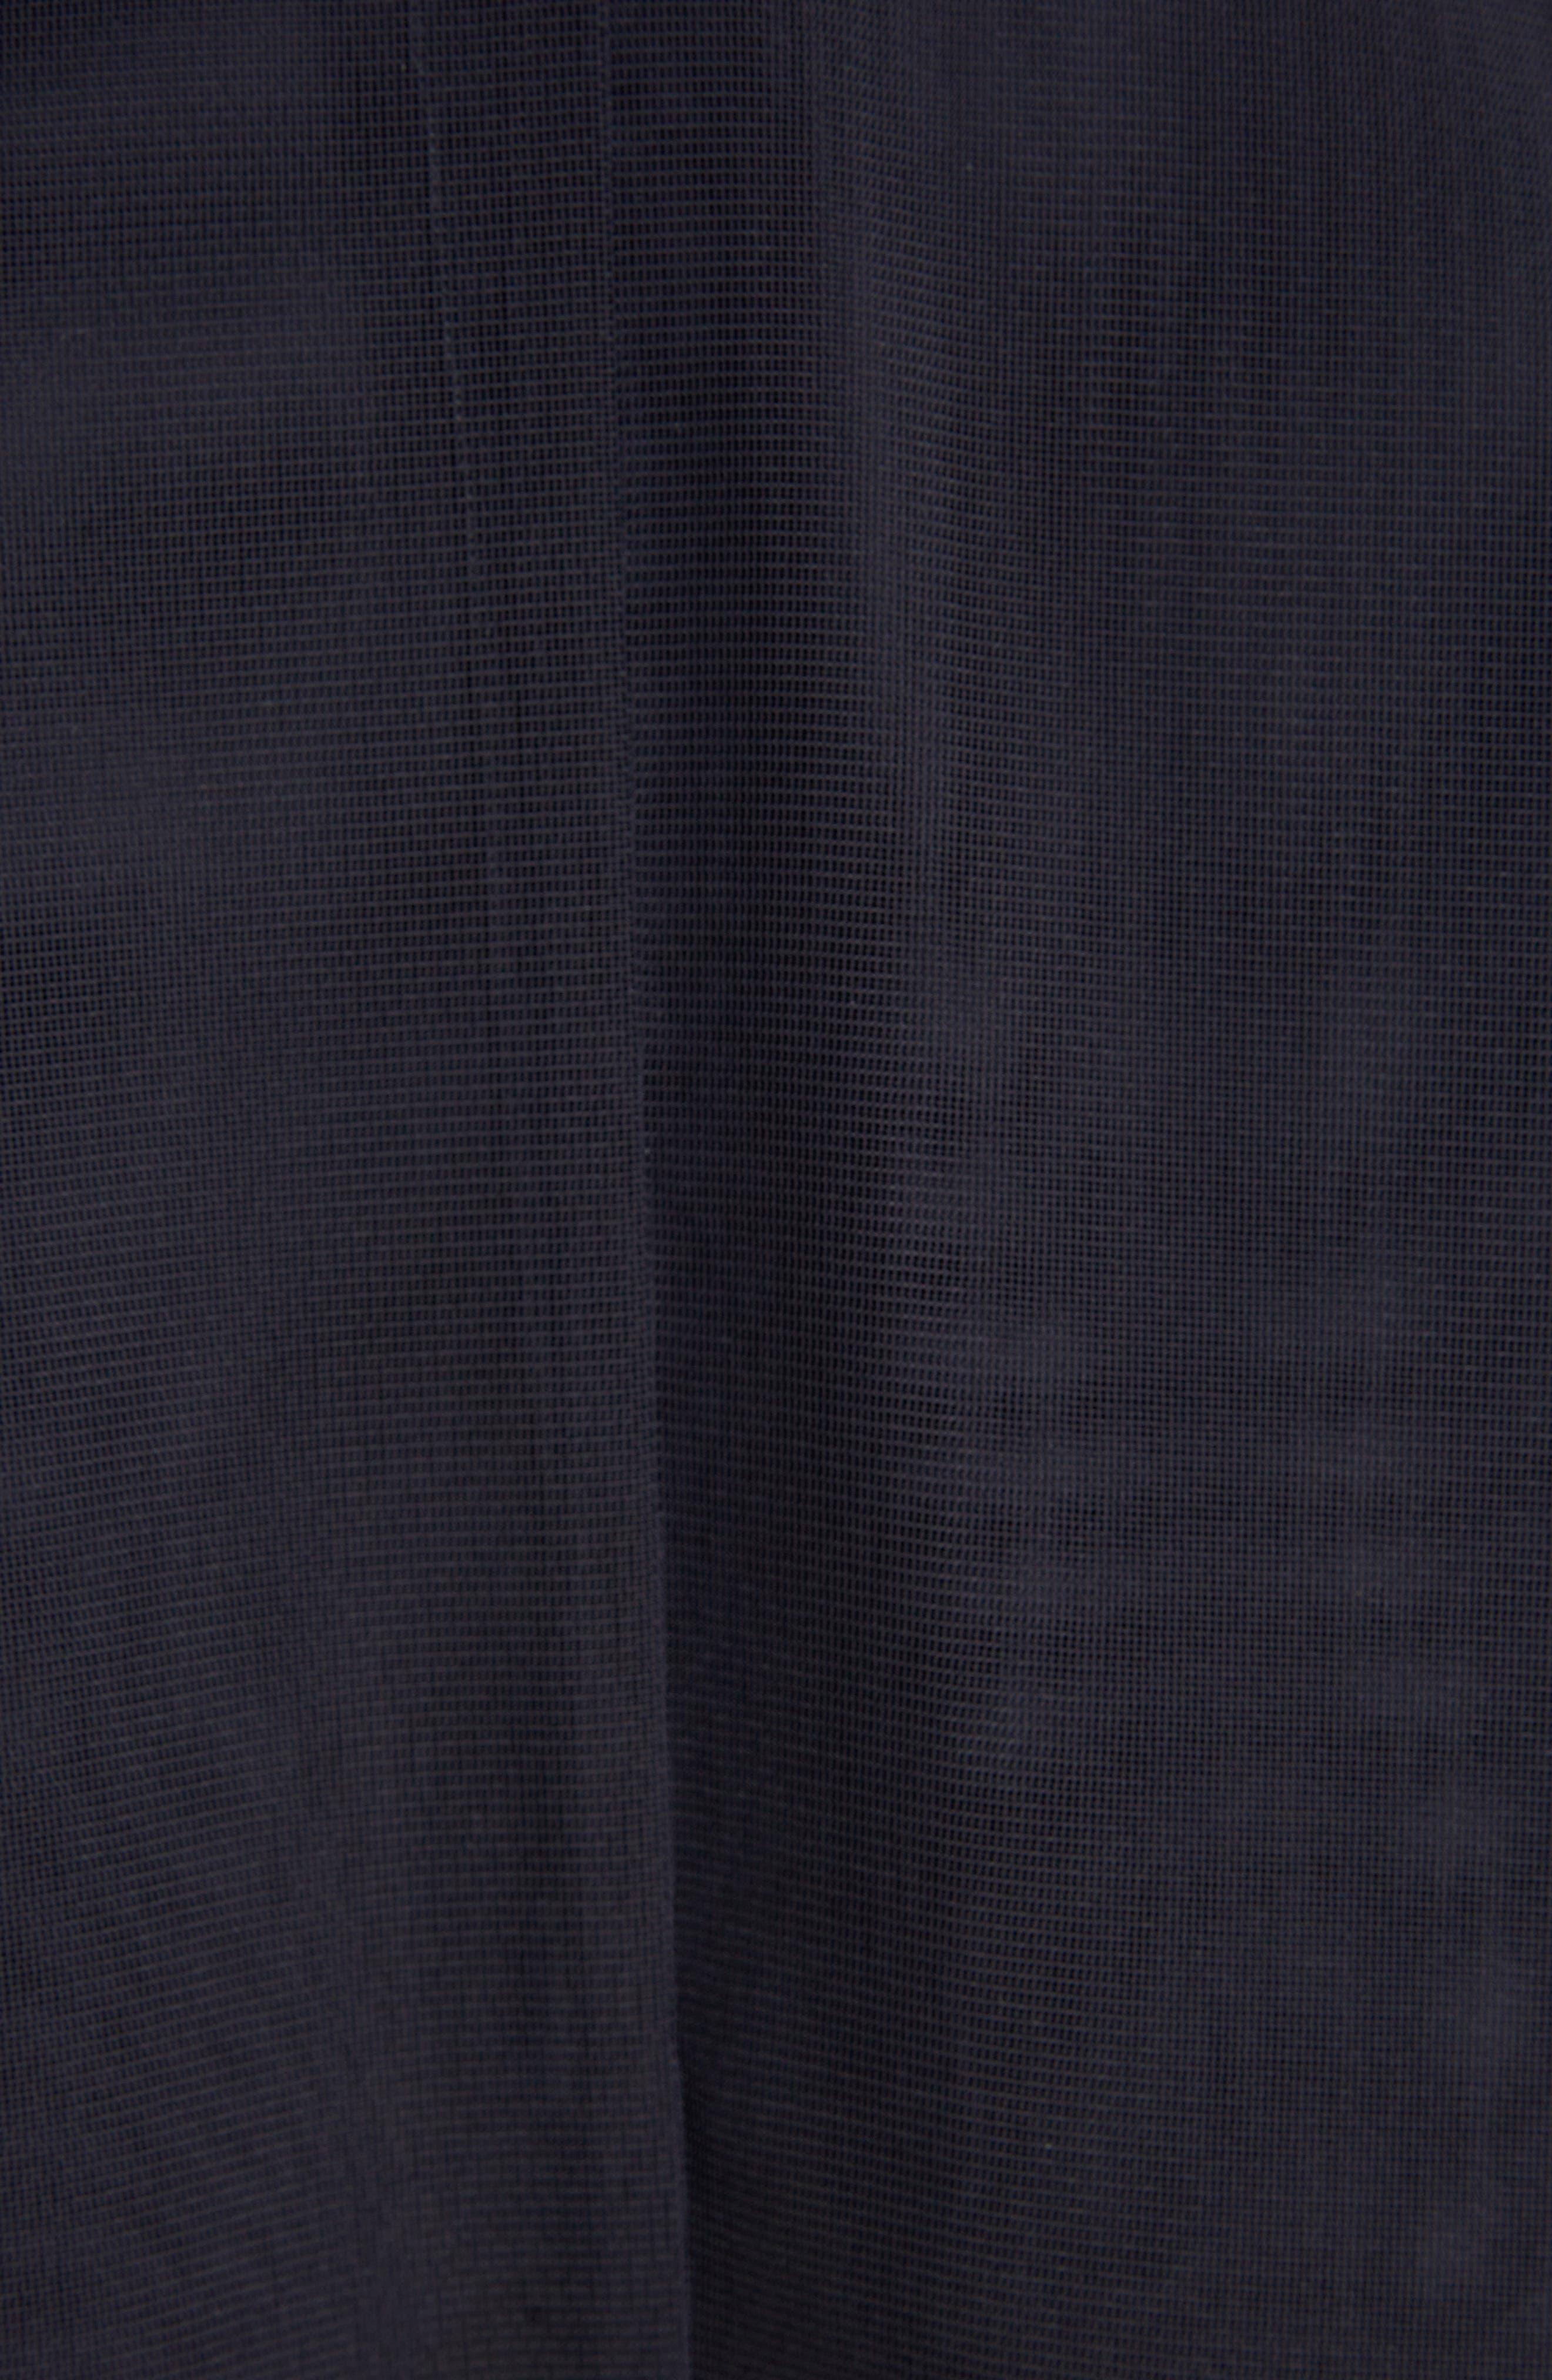 Transparent Trench Coat,                             Alternate thumbnail 6, color,                             Blue